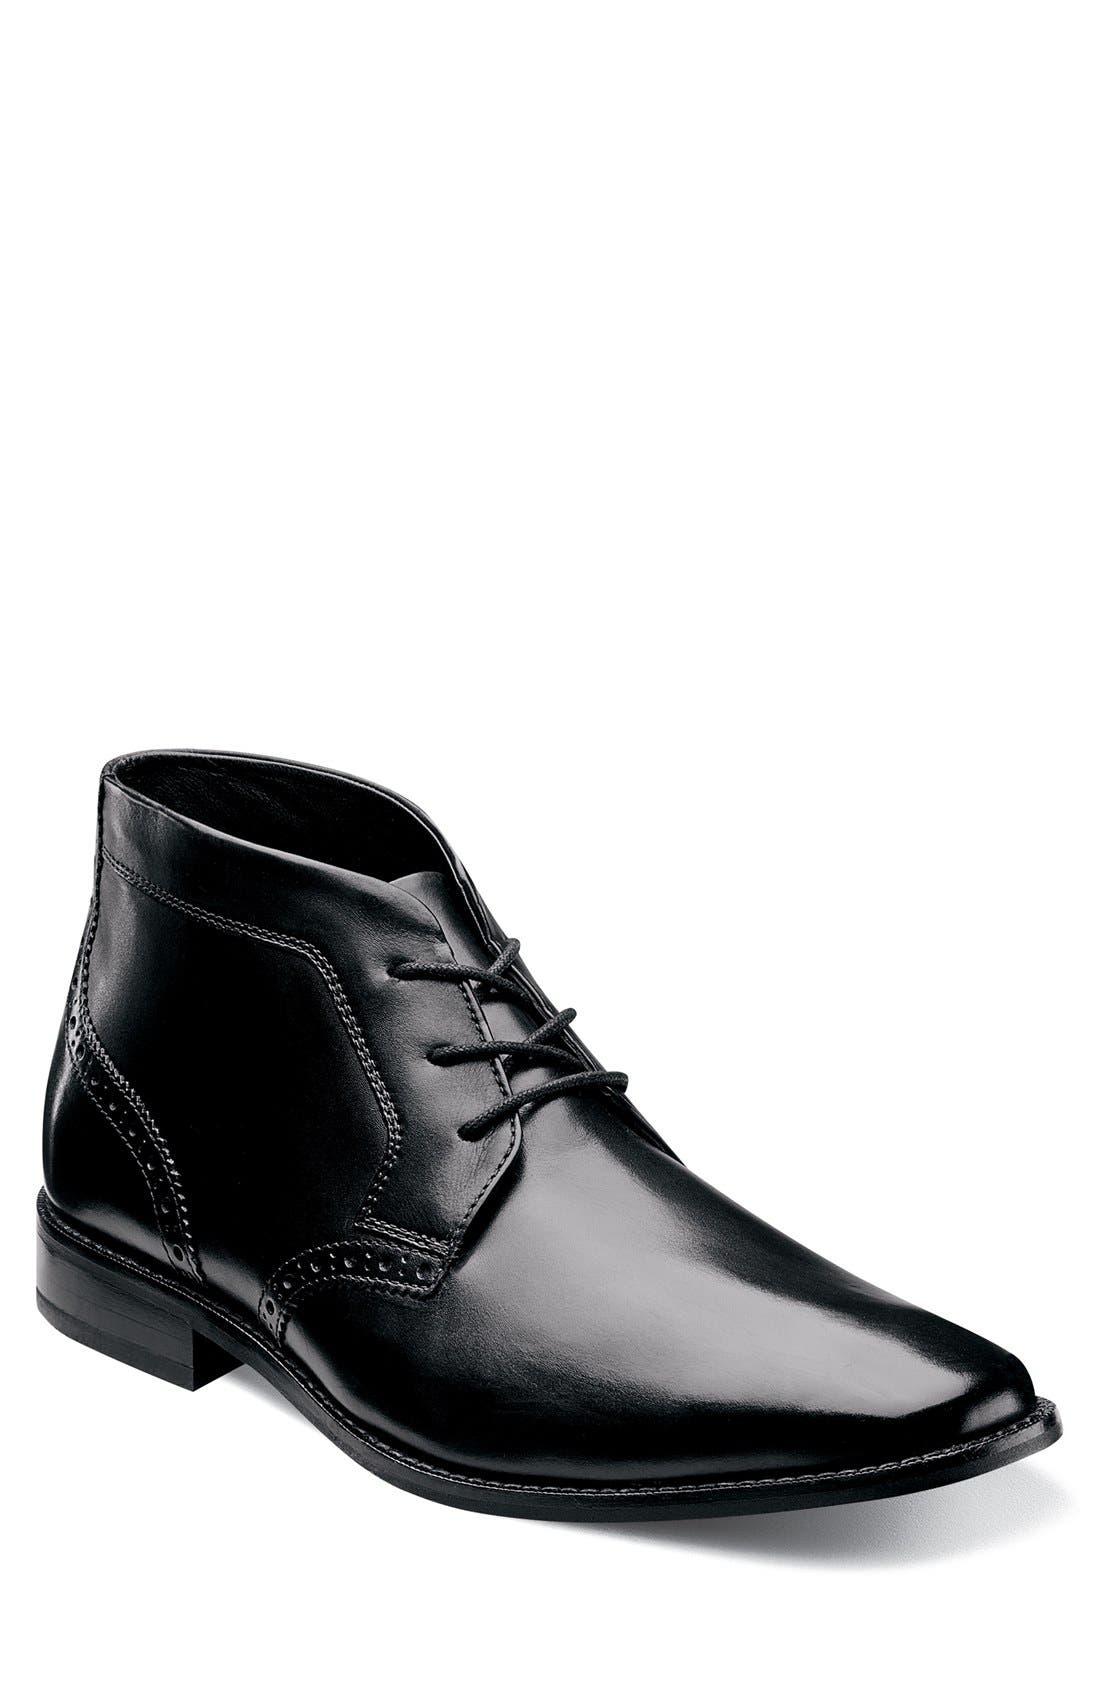 FLORSHEIM 'Castellano' Chukka Boot